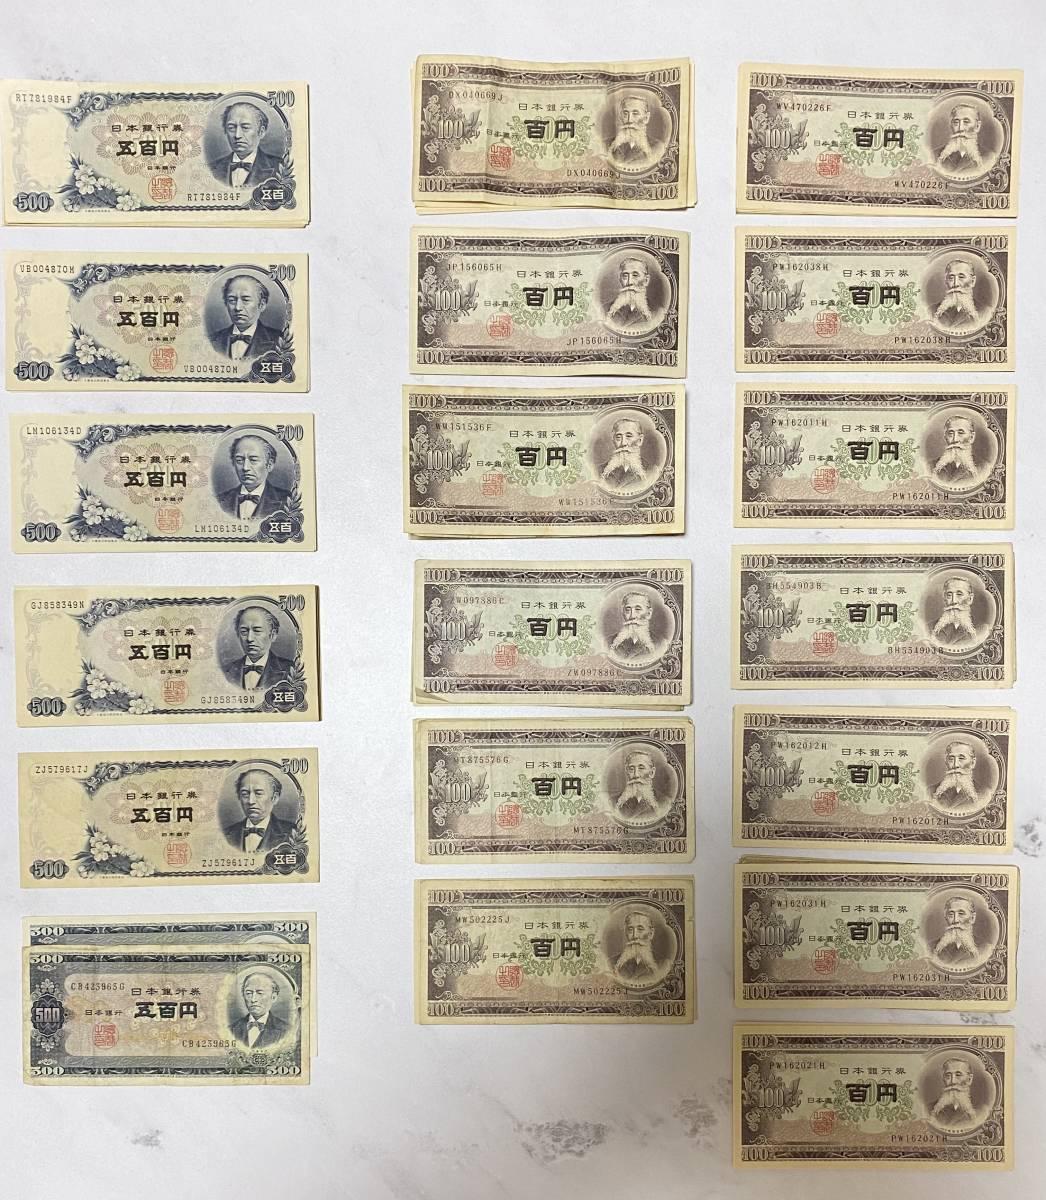 旧紙幣 ●旧五百円札 岩倉具視/41枚 前期500円札/2枚 ●旧百円札 板垣退助/124枚 計167枚 総額33900円分 まとめて